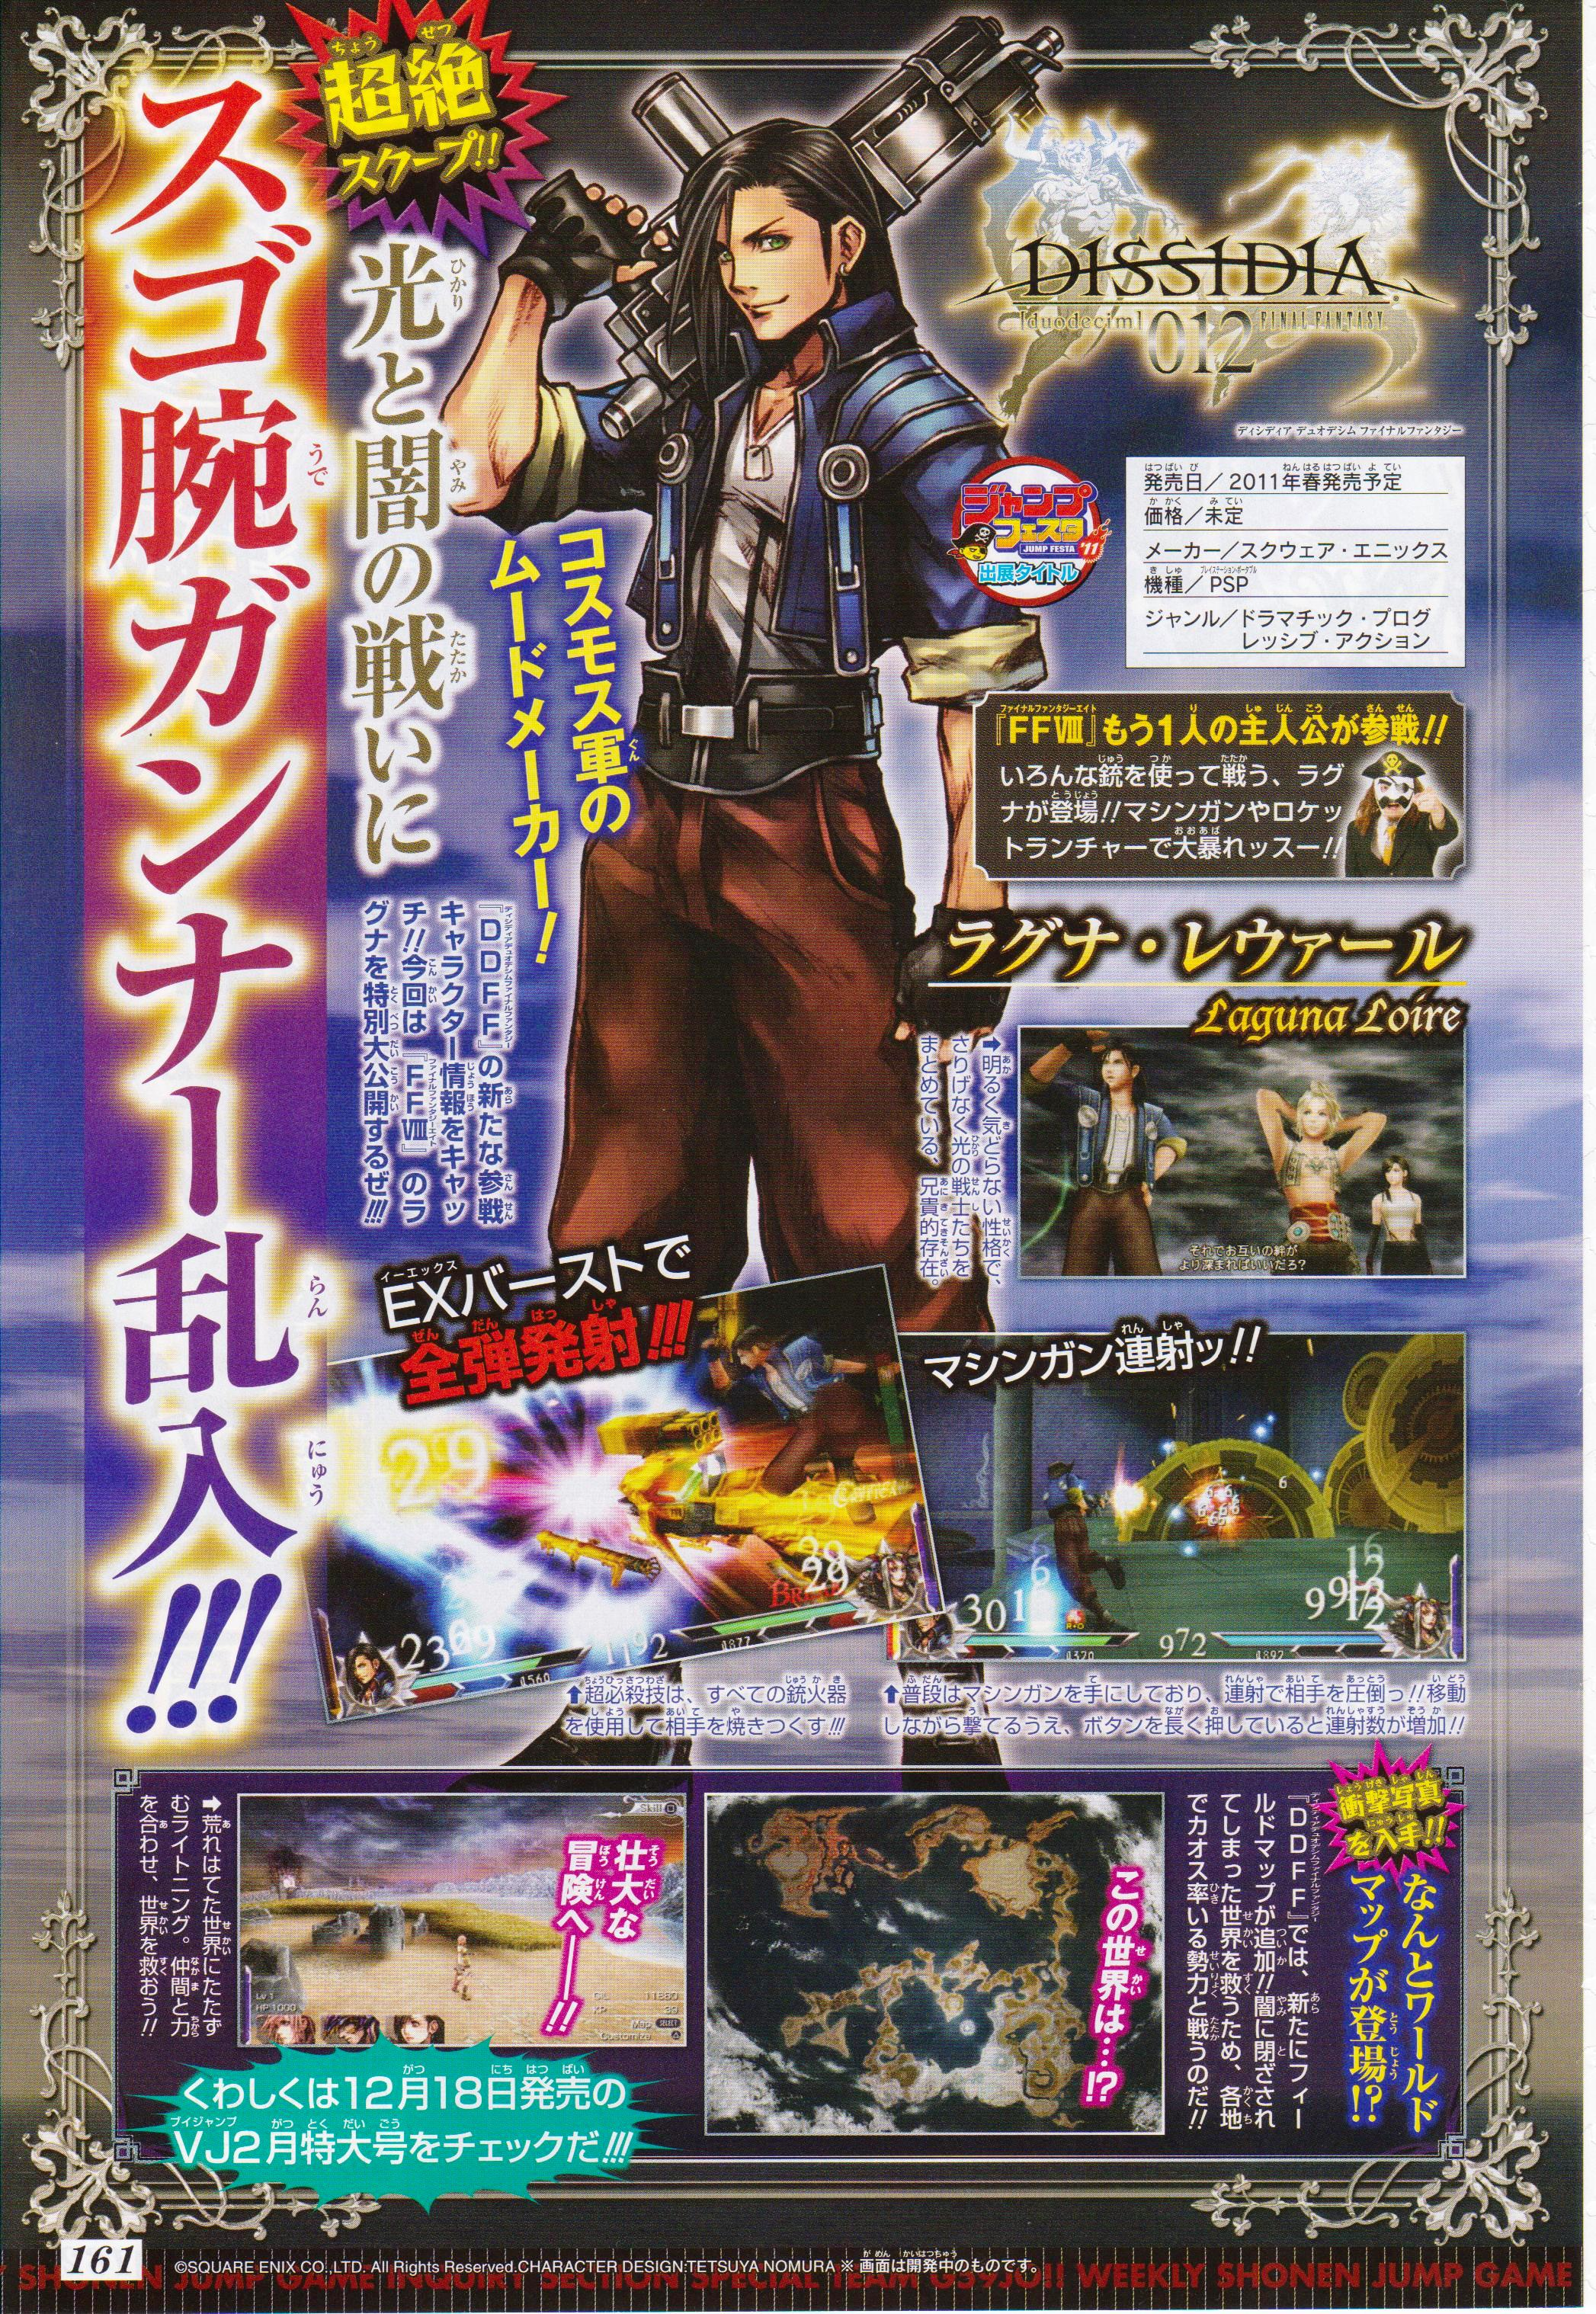 Dissidia 012 [Duodecim] Final Fantasy - Новый персонаж!